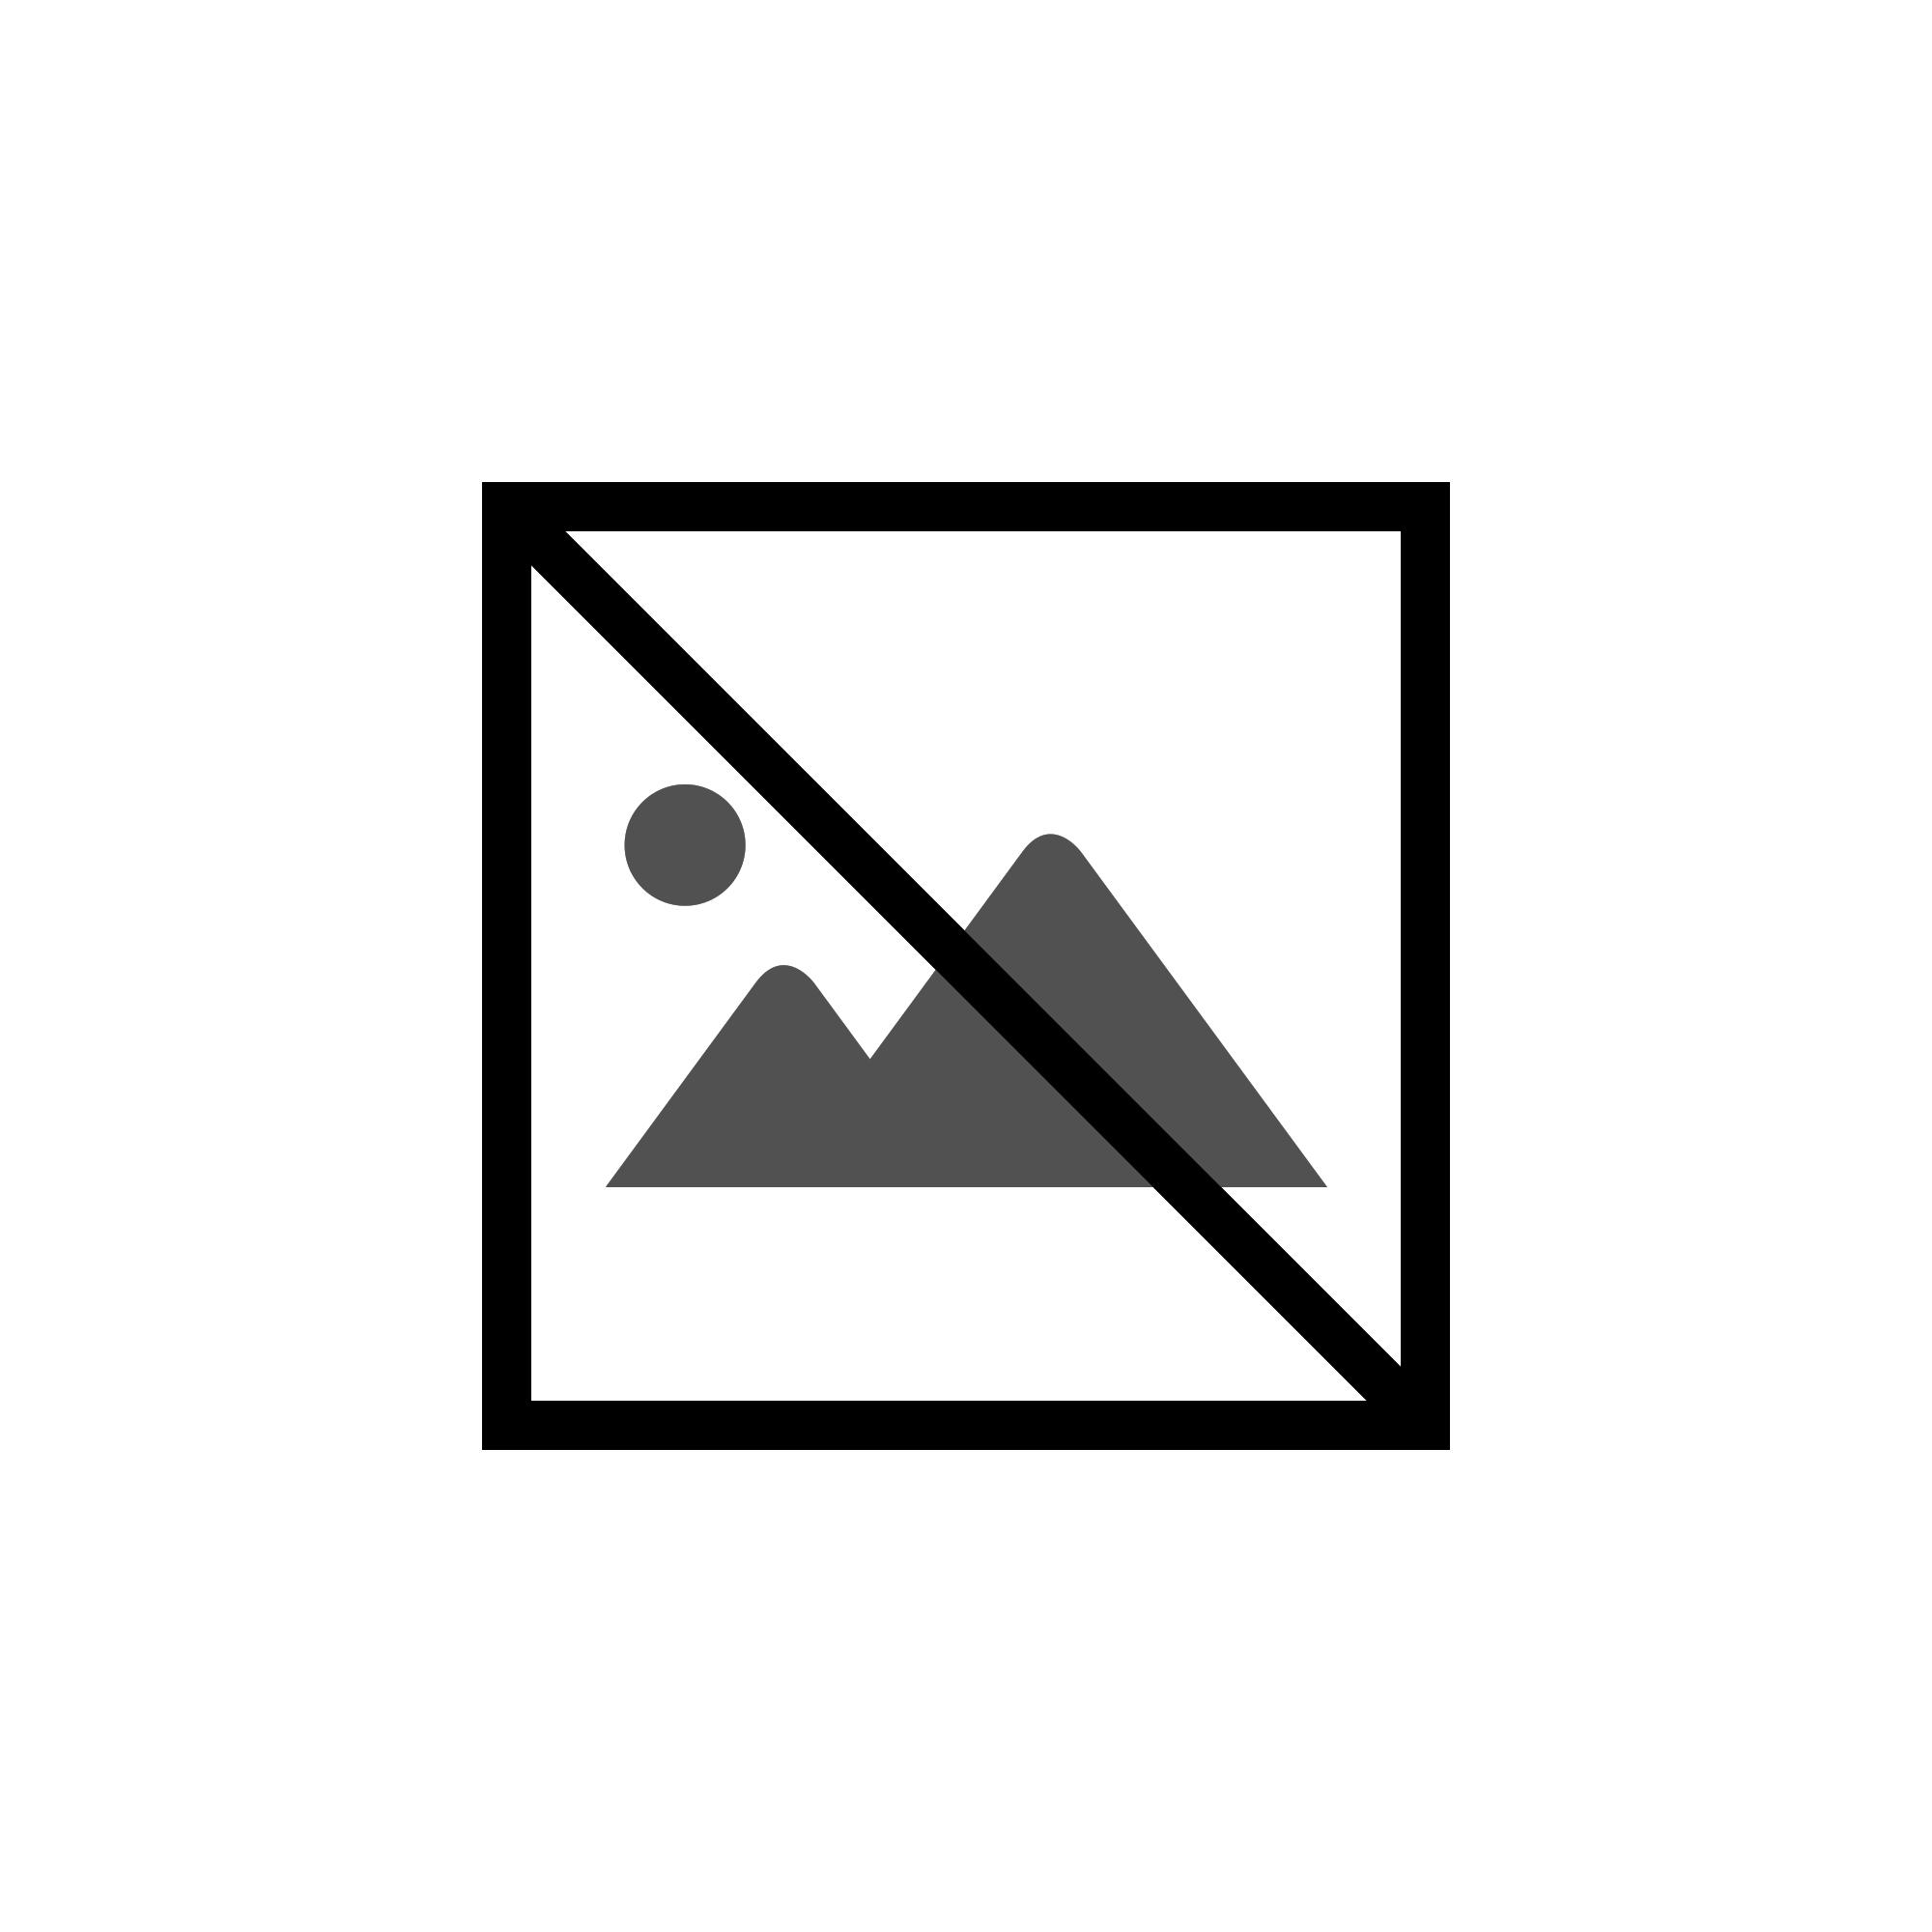 Antevisão Belenenses 2014/2015